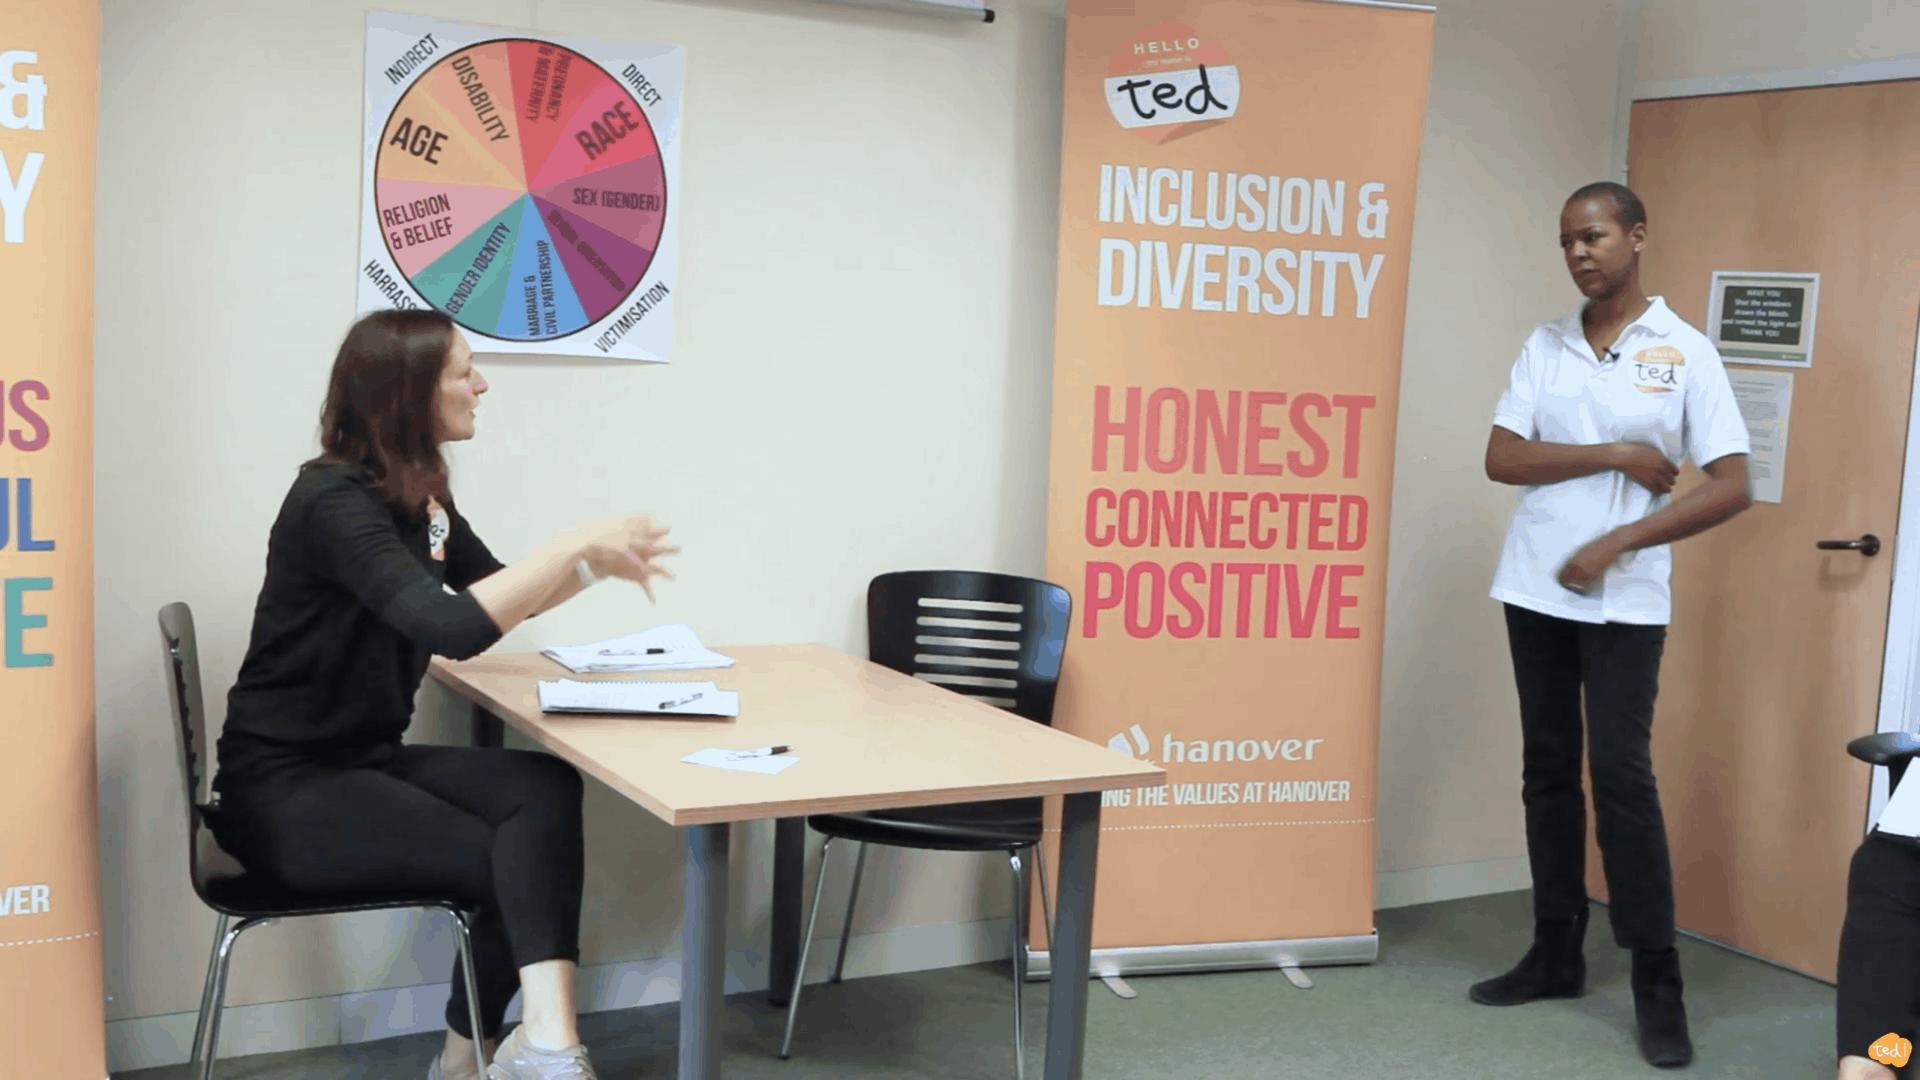 Inclusion & Values